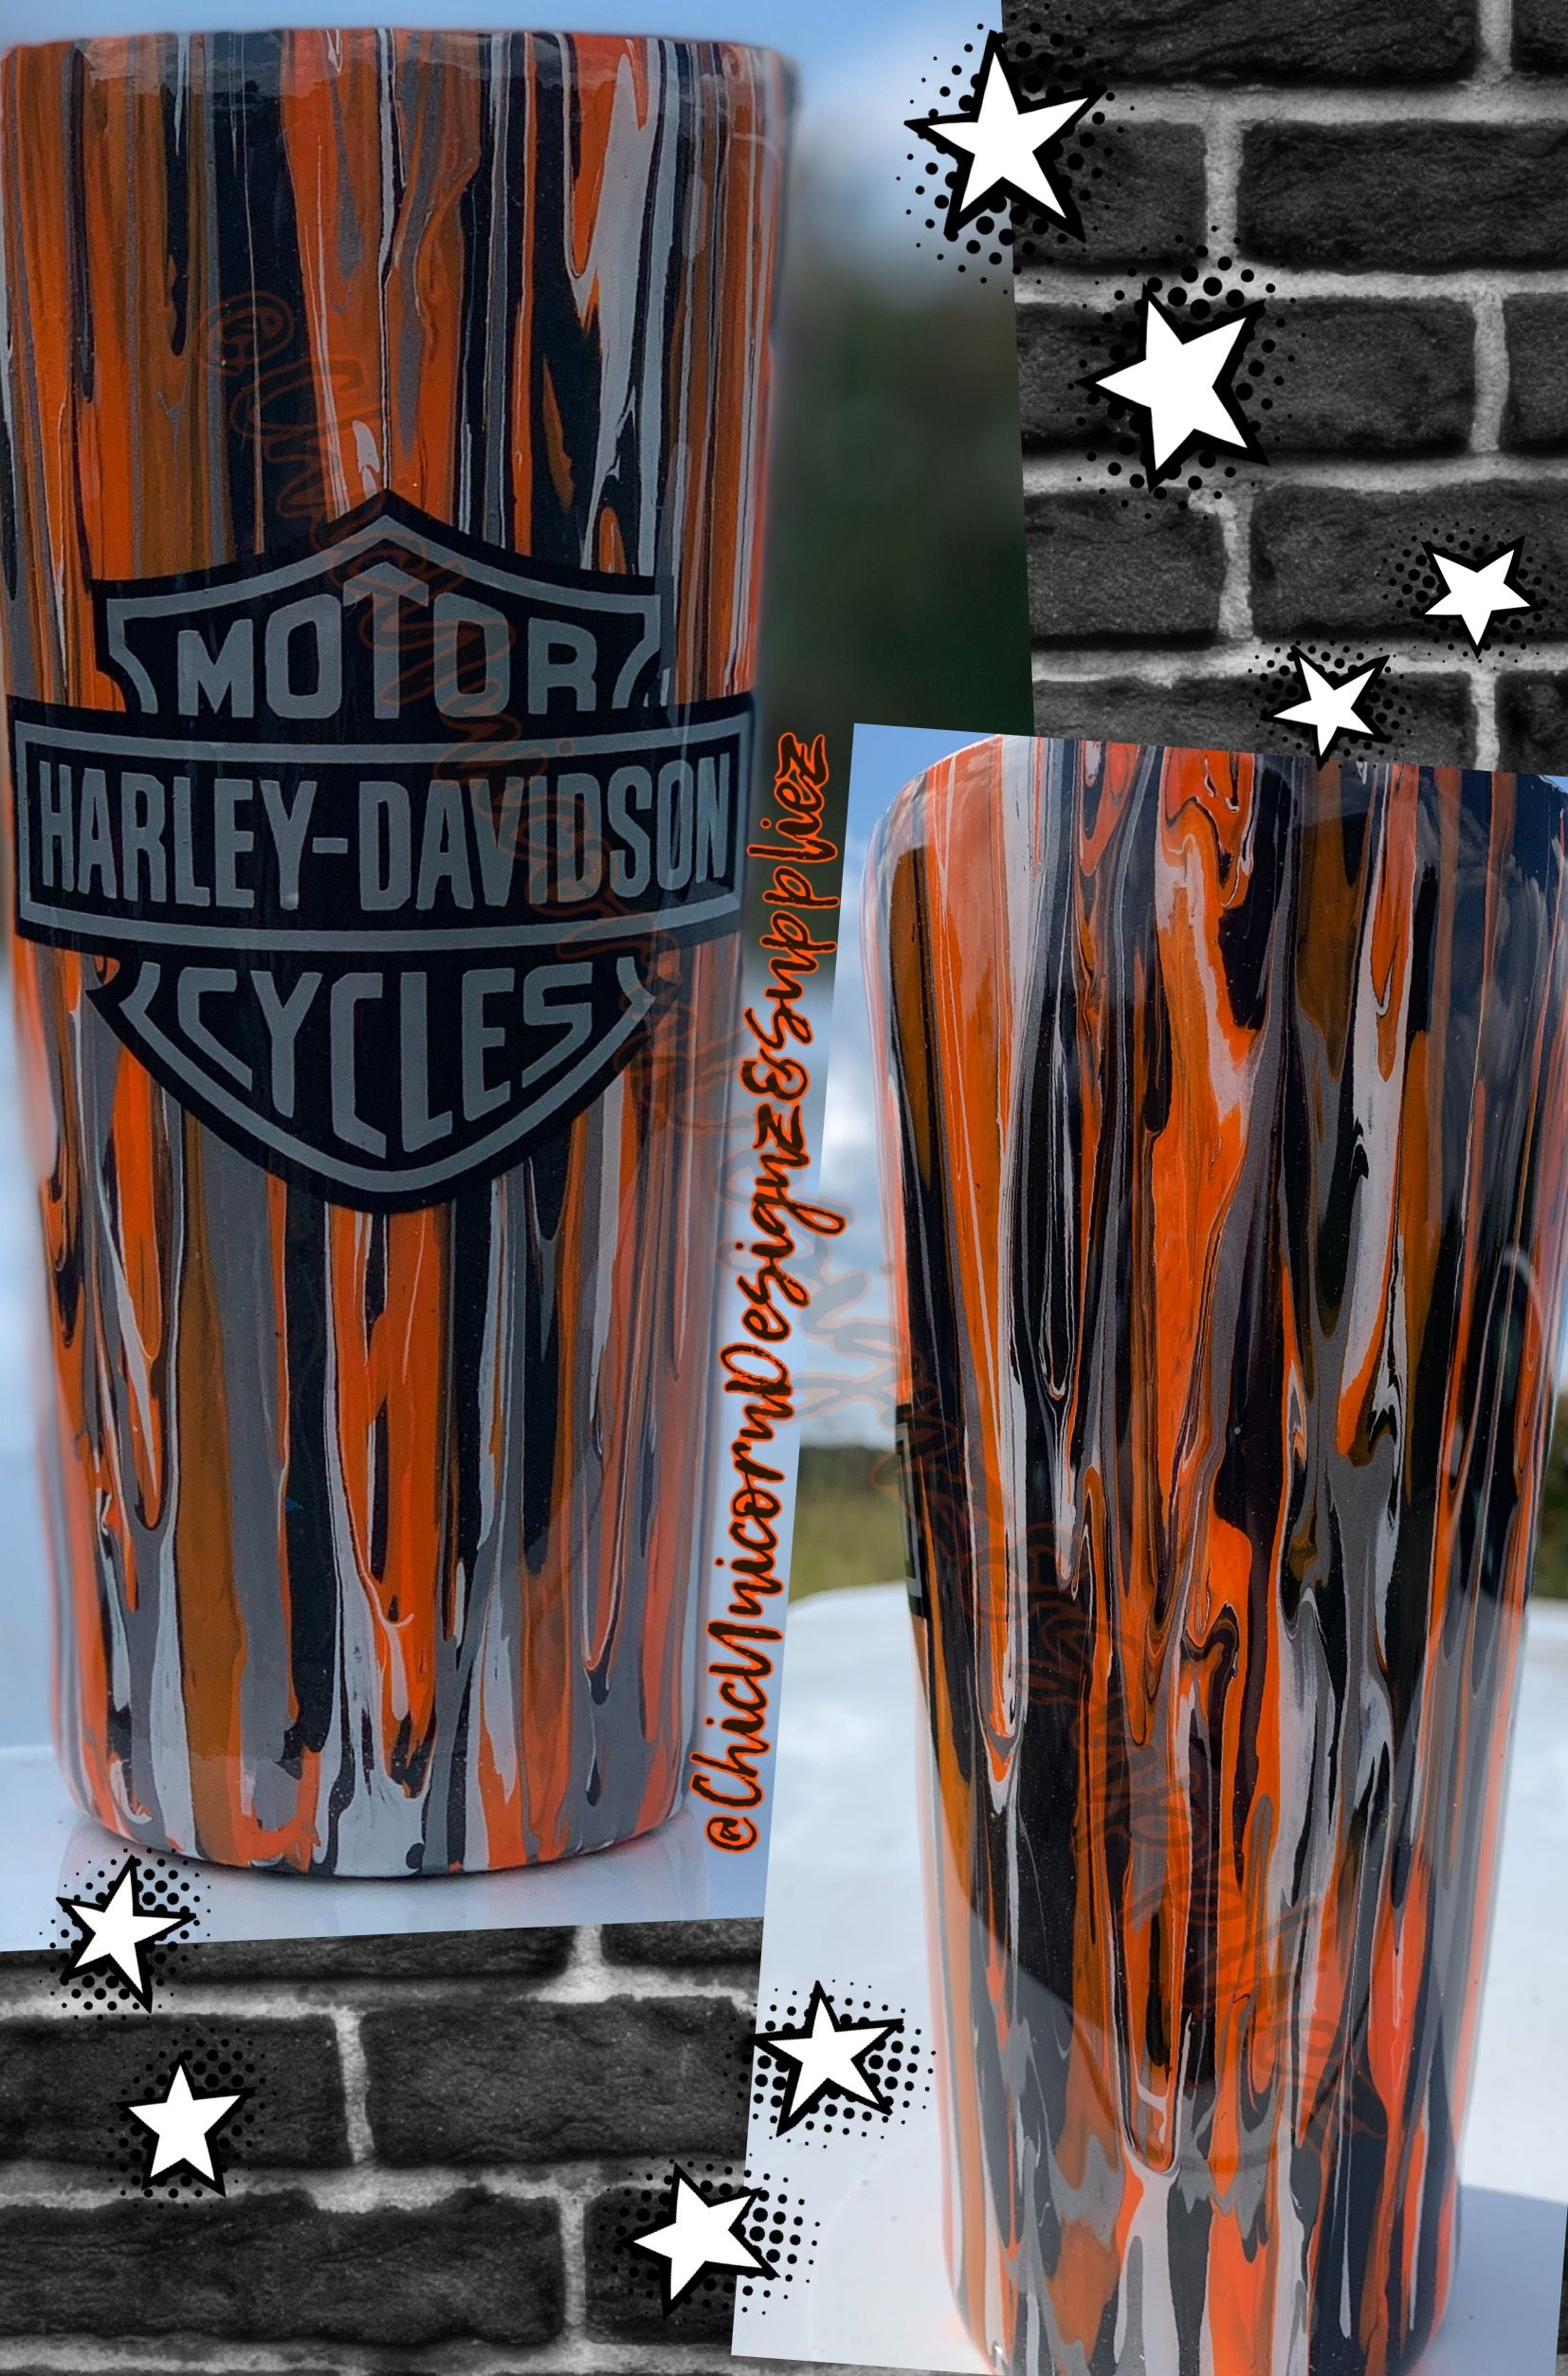 Harley Davidson Acrylic Paint Drip Tumbler 32oz Custom Tumbler Cups Vinyl Tumblers Tumbler Designs